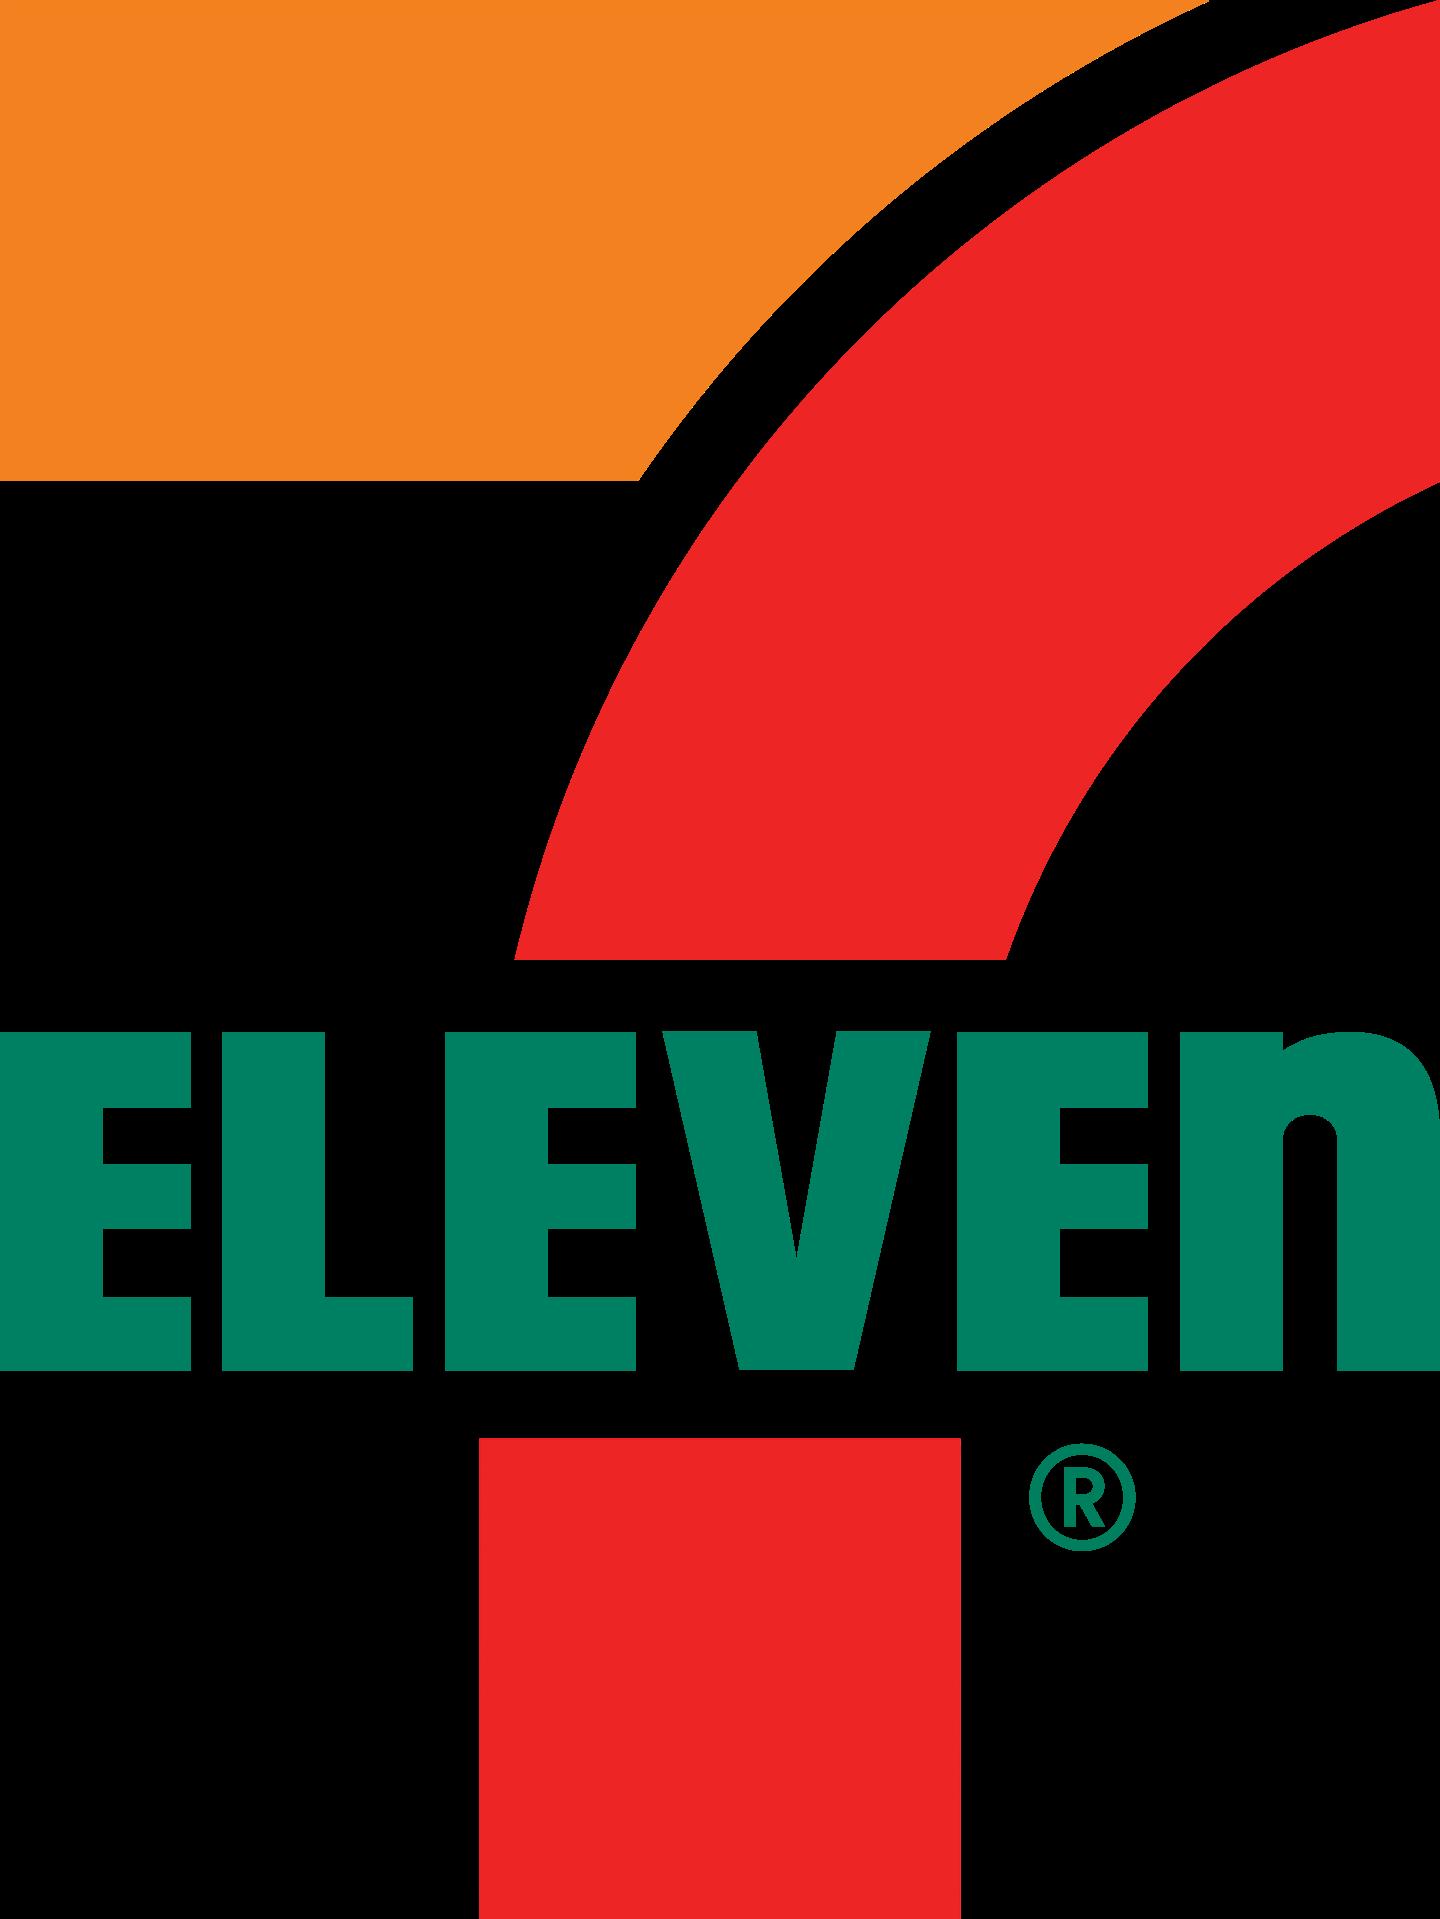 7 eleven logo 2 - 7-Eleven Logo